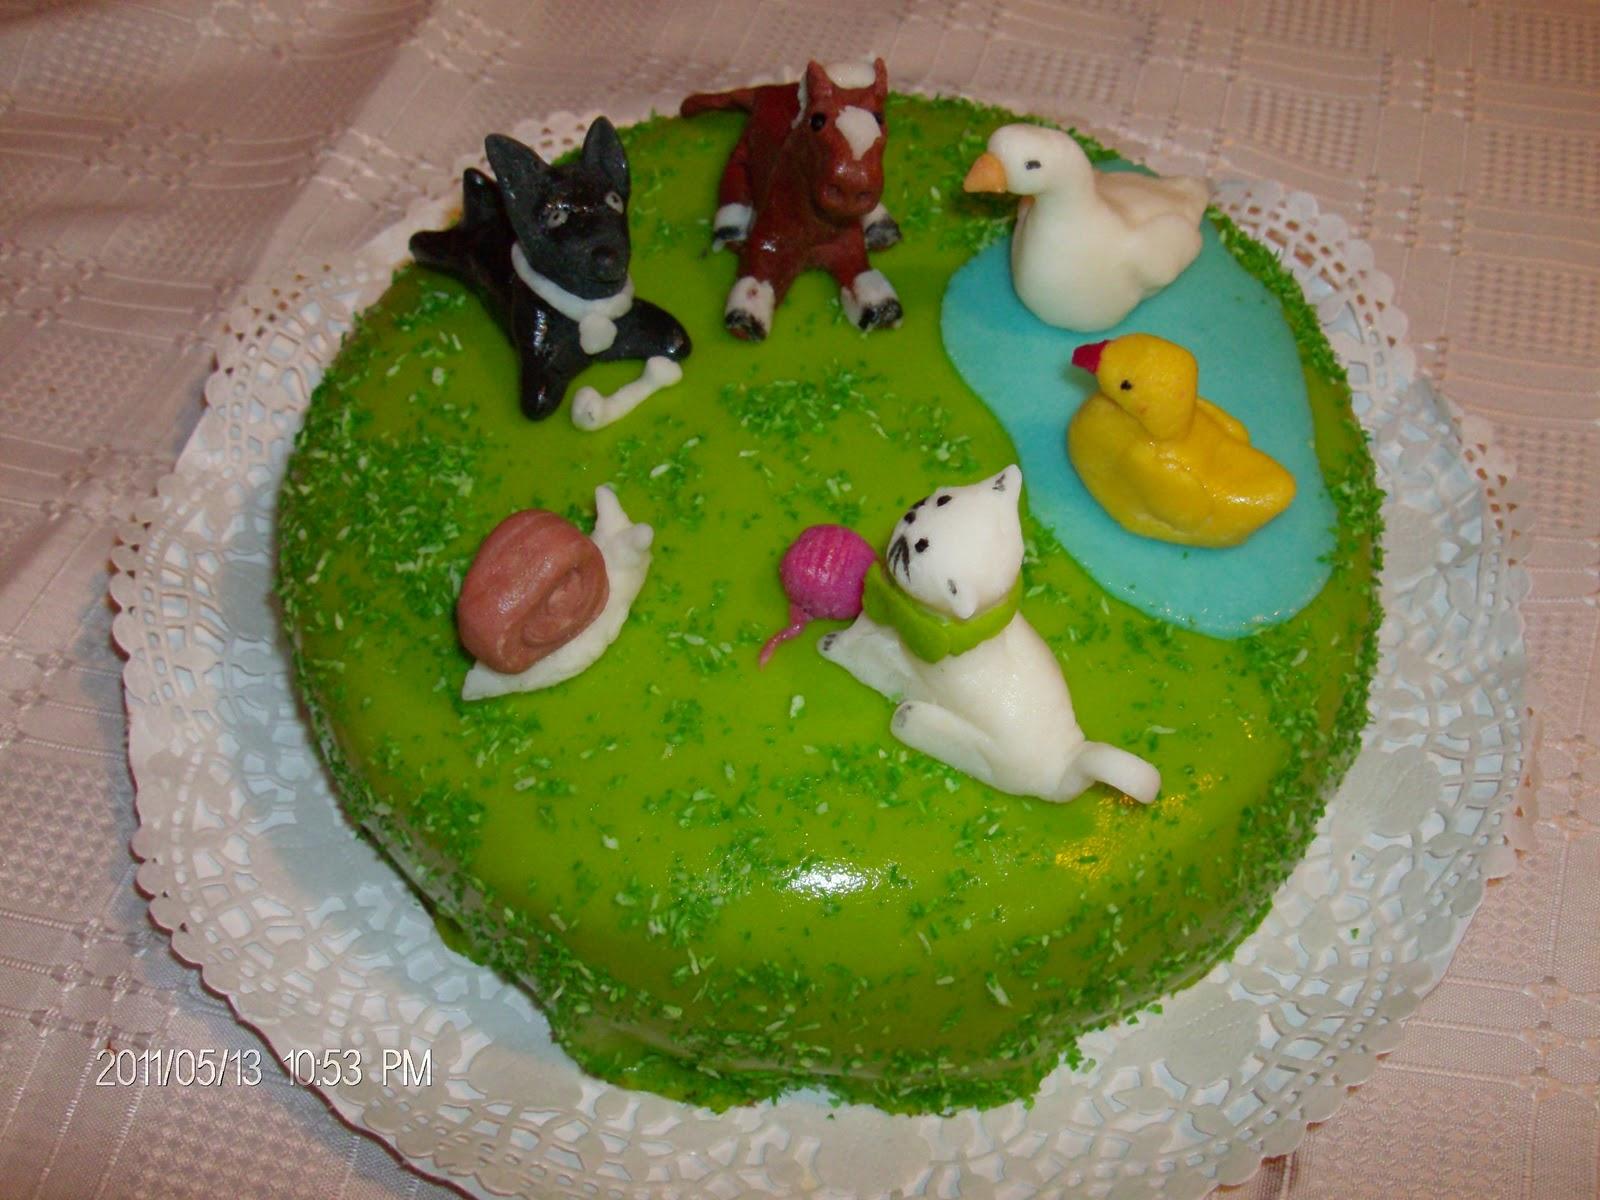 állatos torta képek Gigi kreatív műhely: állatos torta állatos torta képek